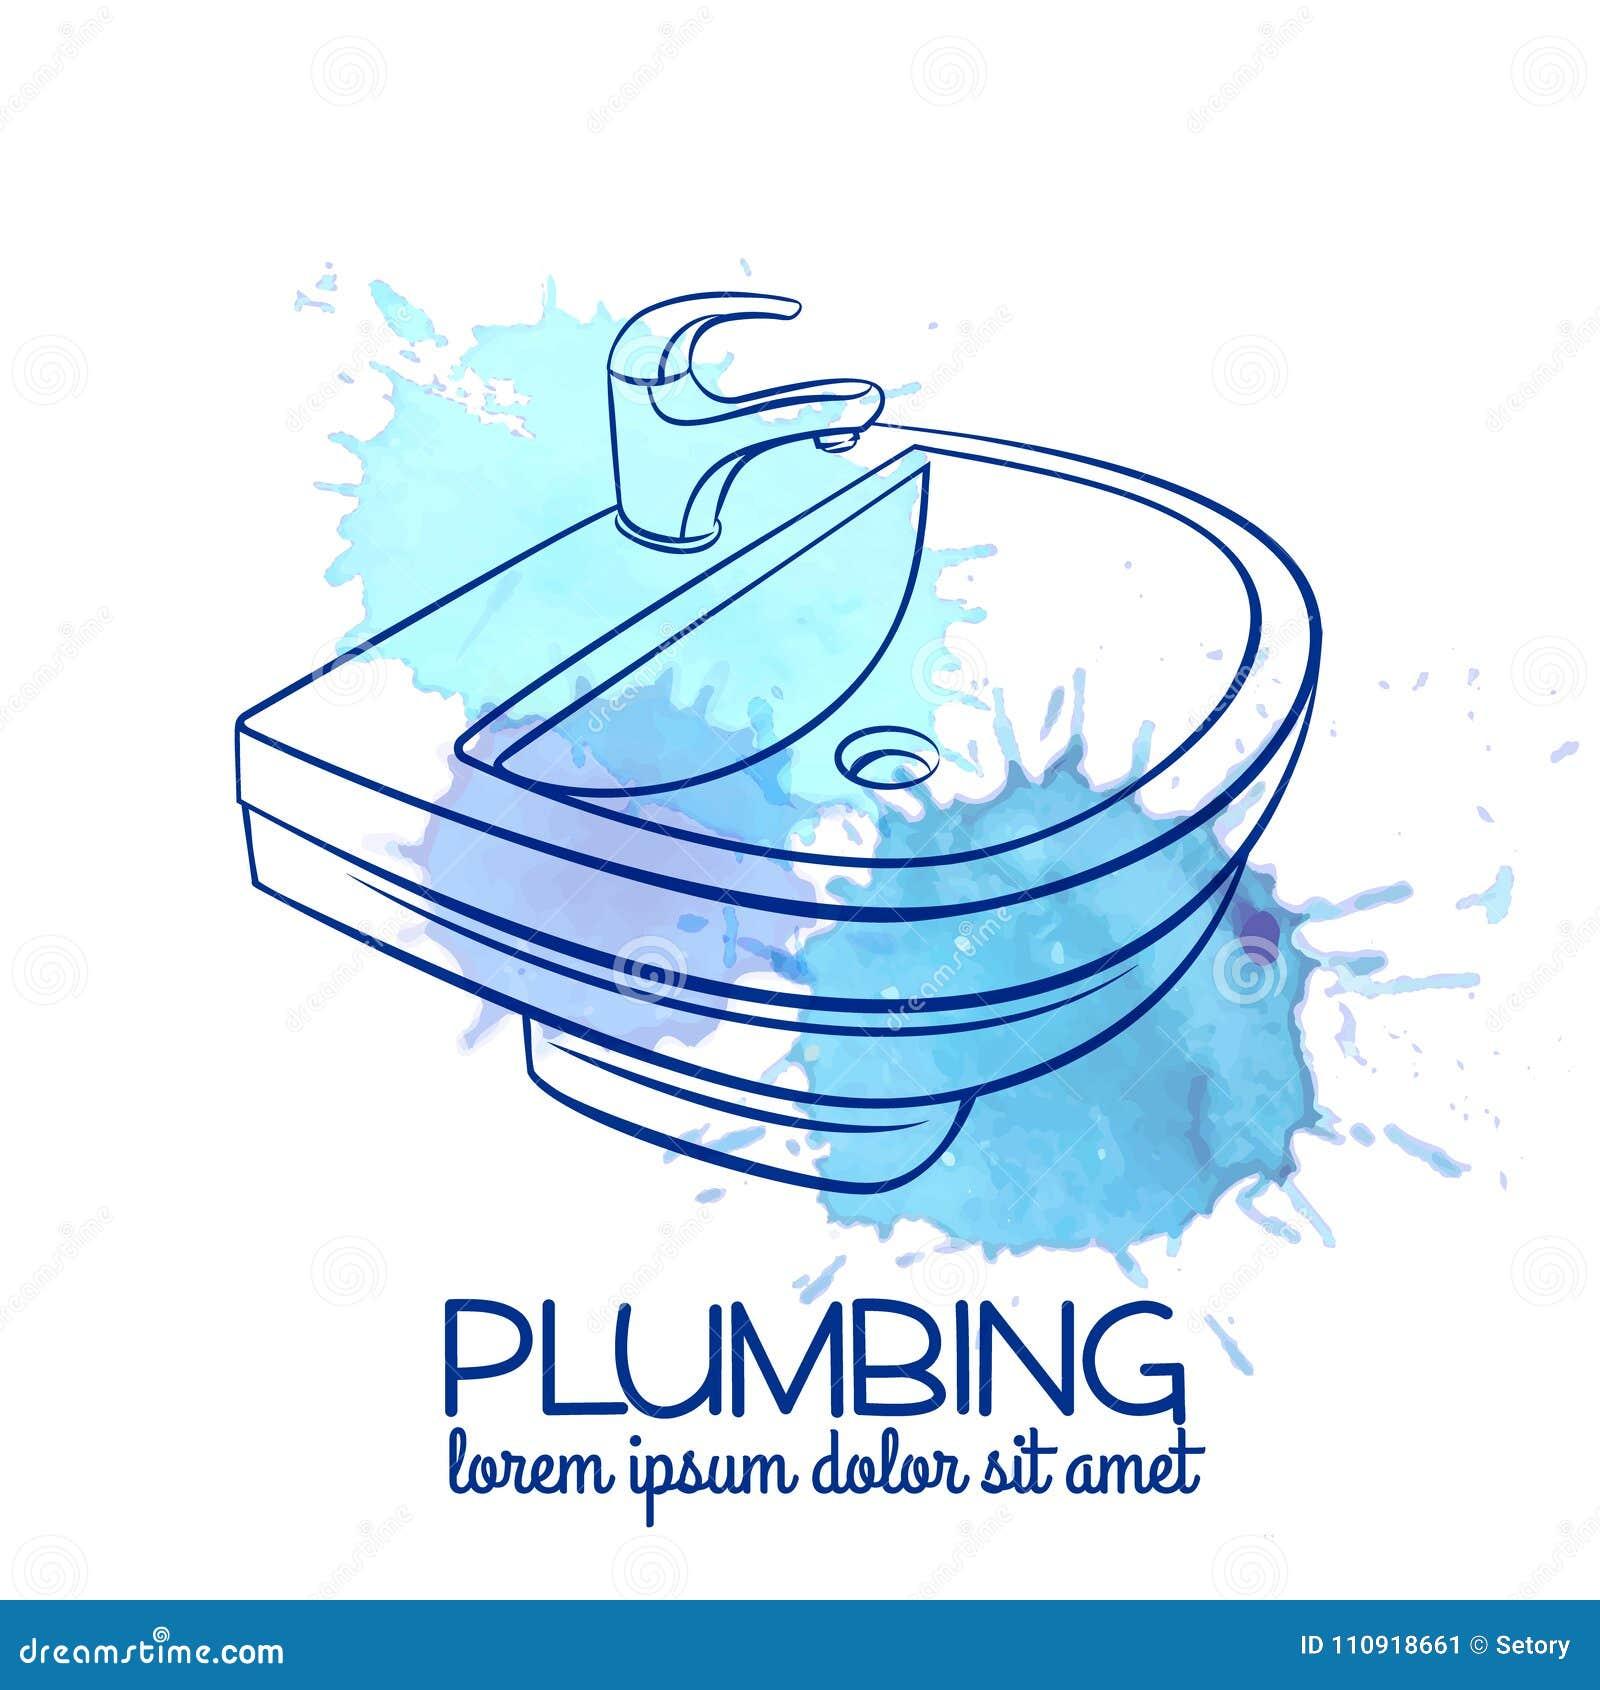 Bathroom sink badge stock vector. Illustration of household - 110918661